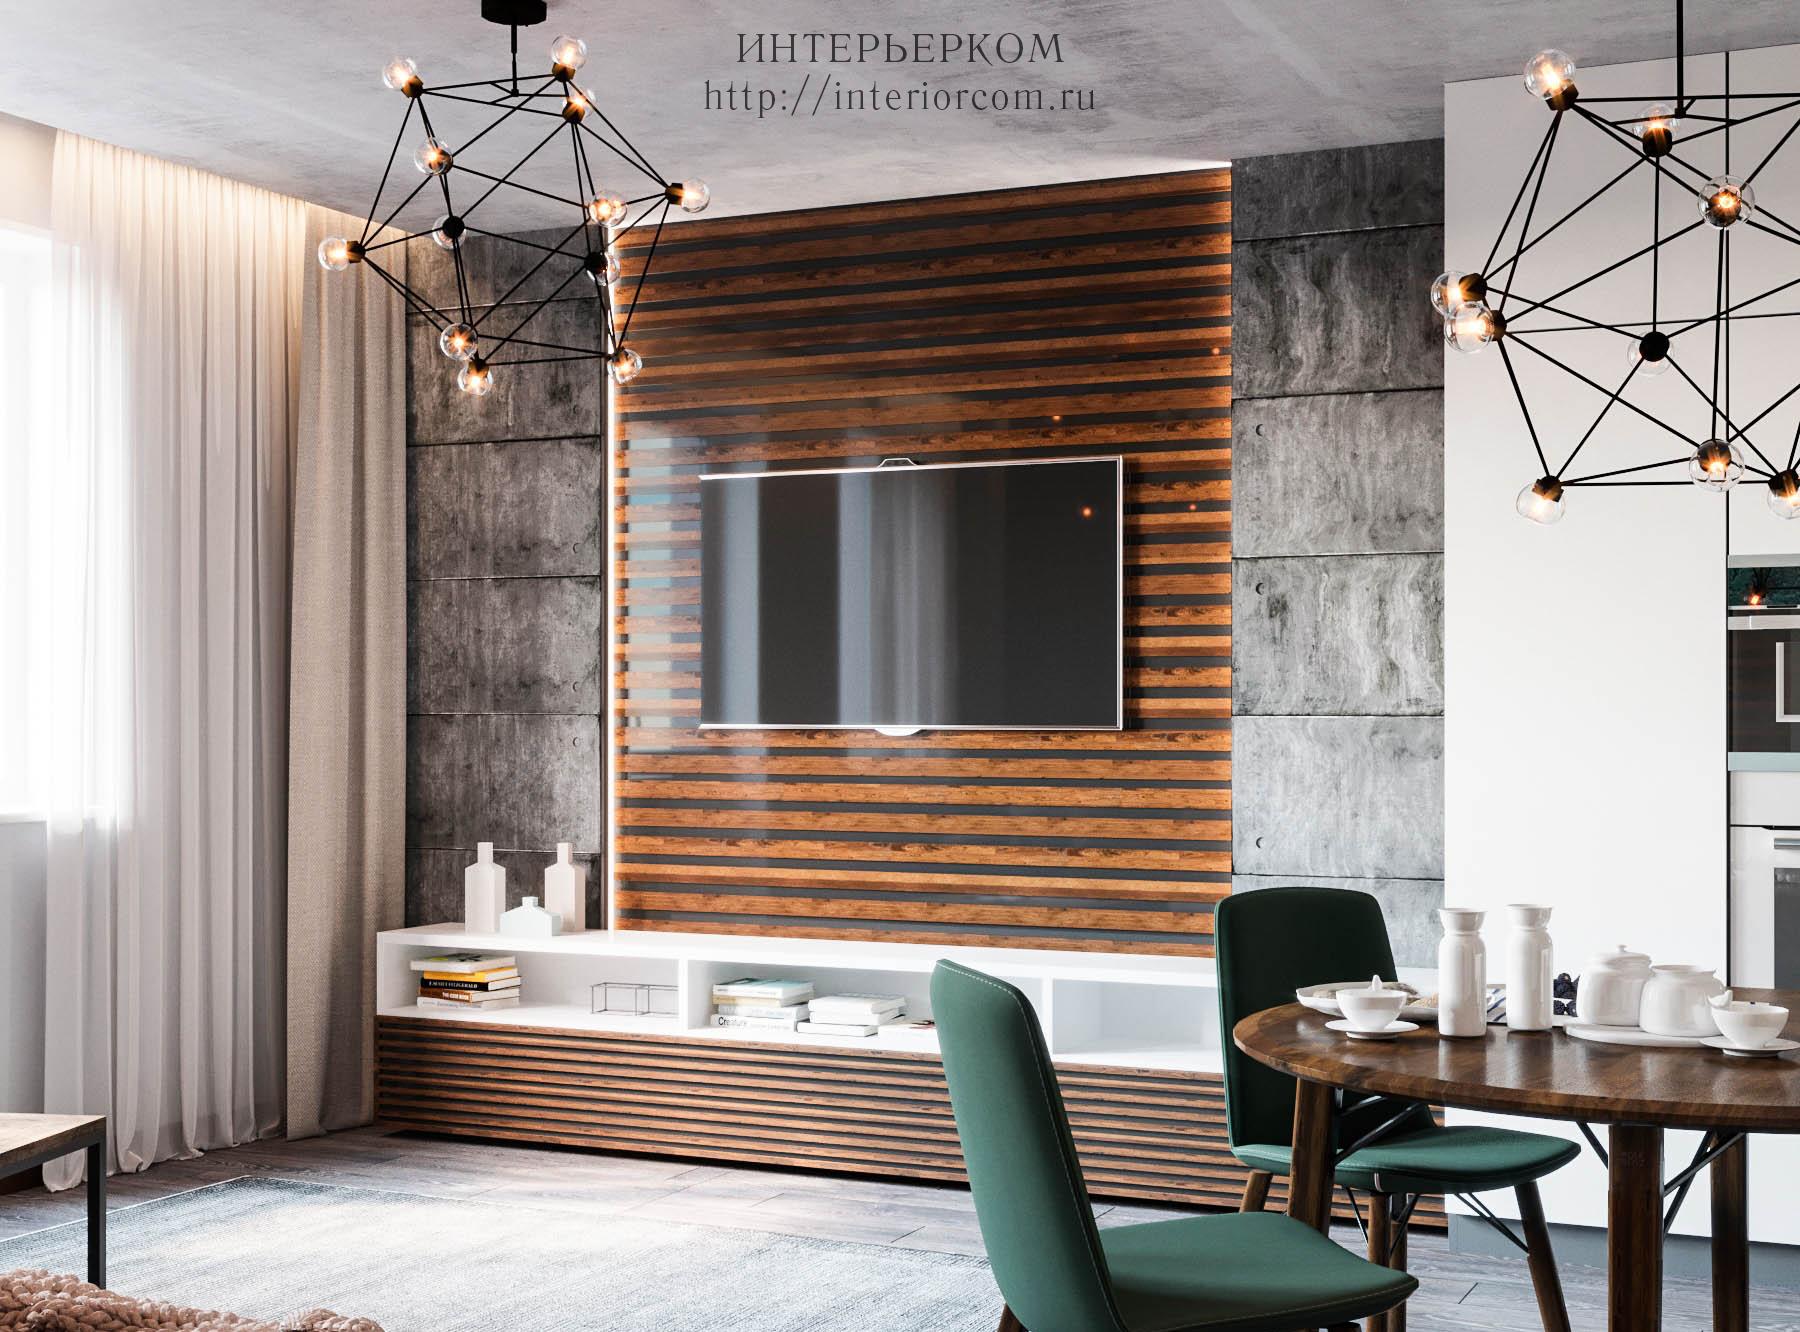 дизайн зоны ТВ в проекте квартиры в стиле лофт